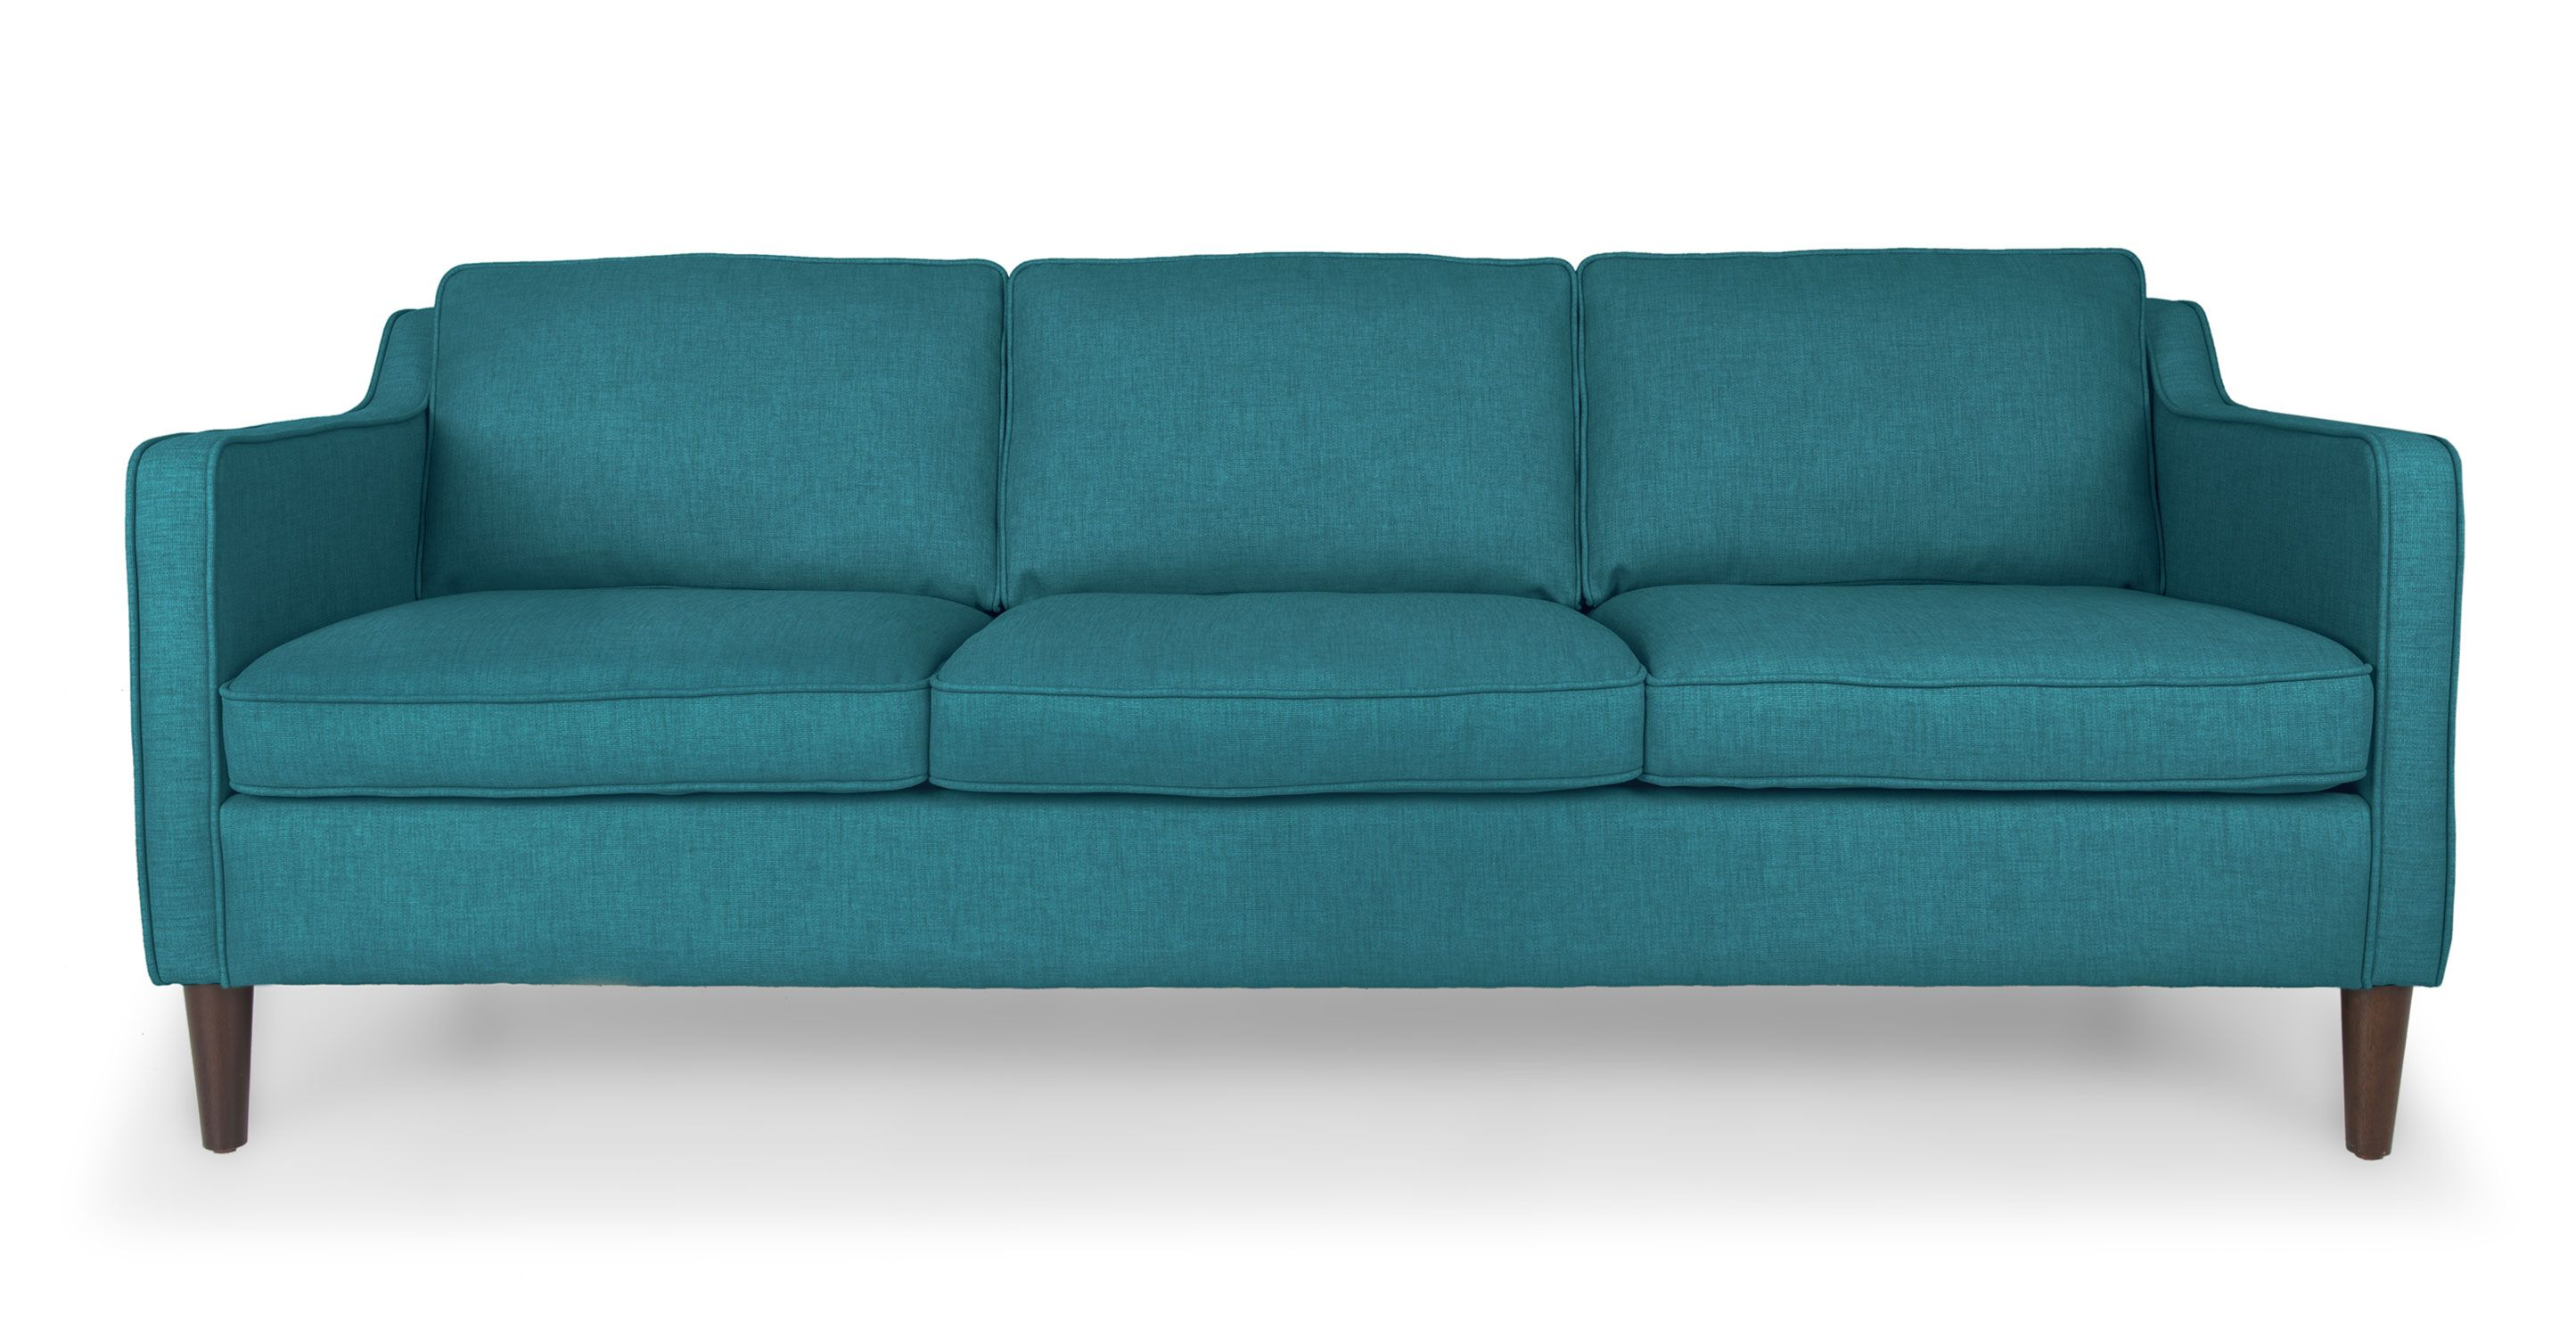 Teal Mid Century Modern Sofa